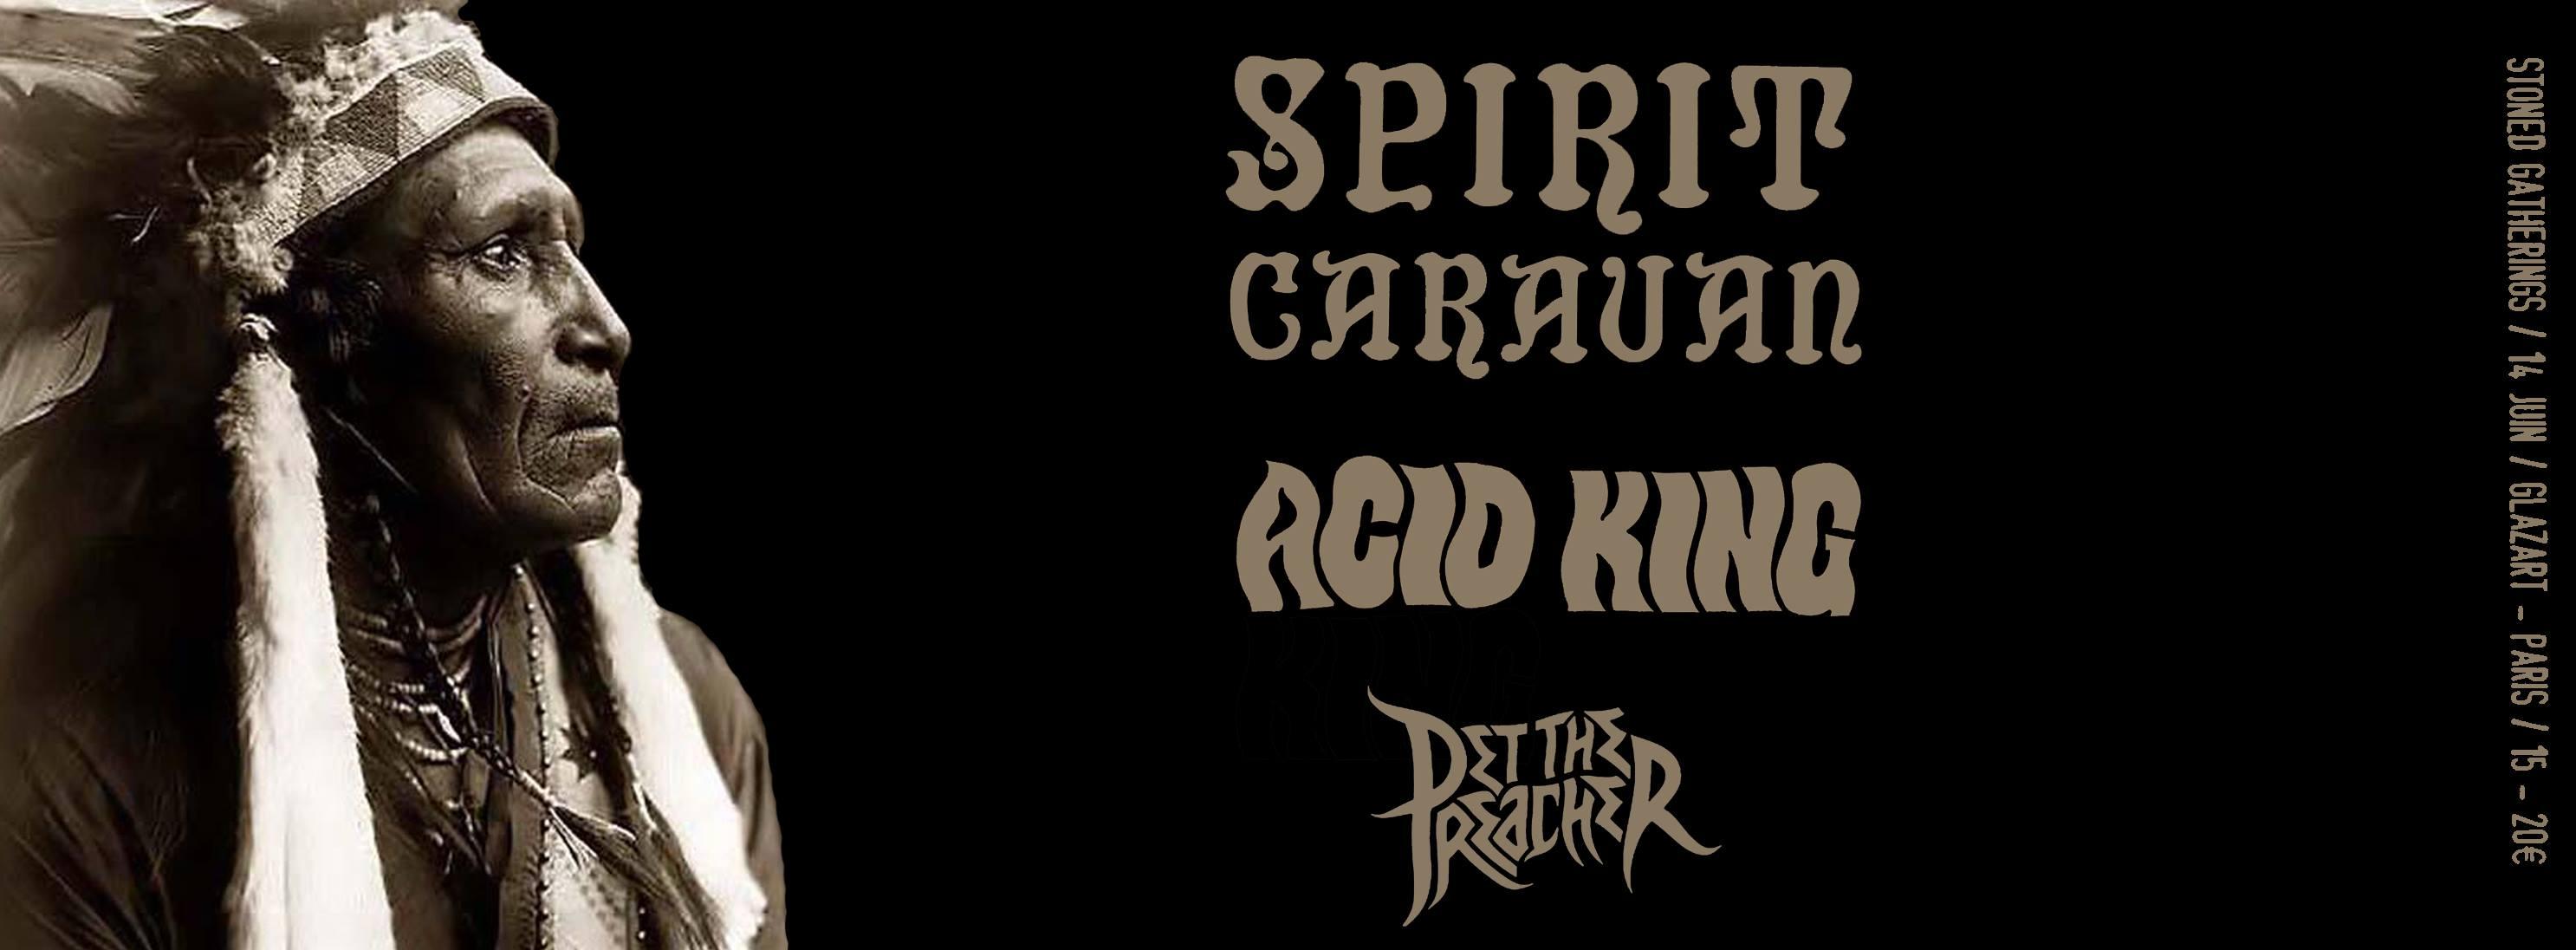 Spirit Caravan + Acid King @ Glazart (Paris), le 14 Juin 2014